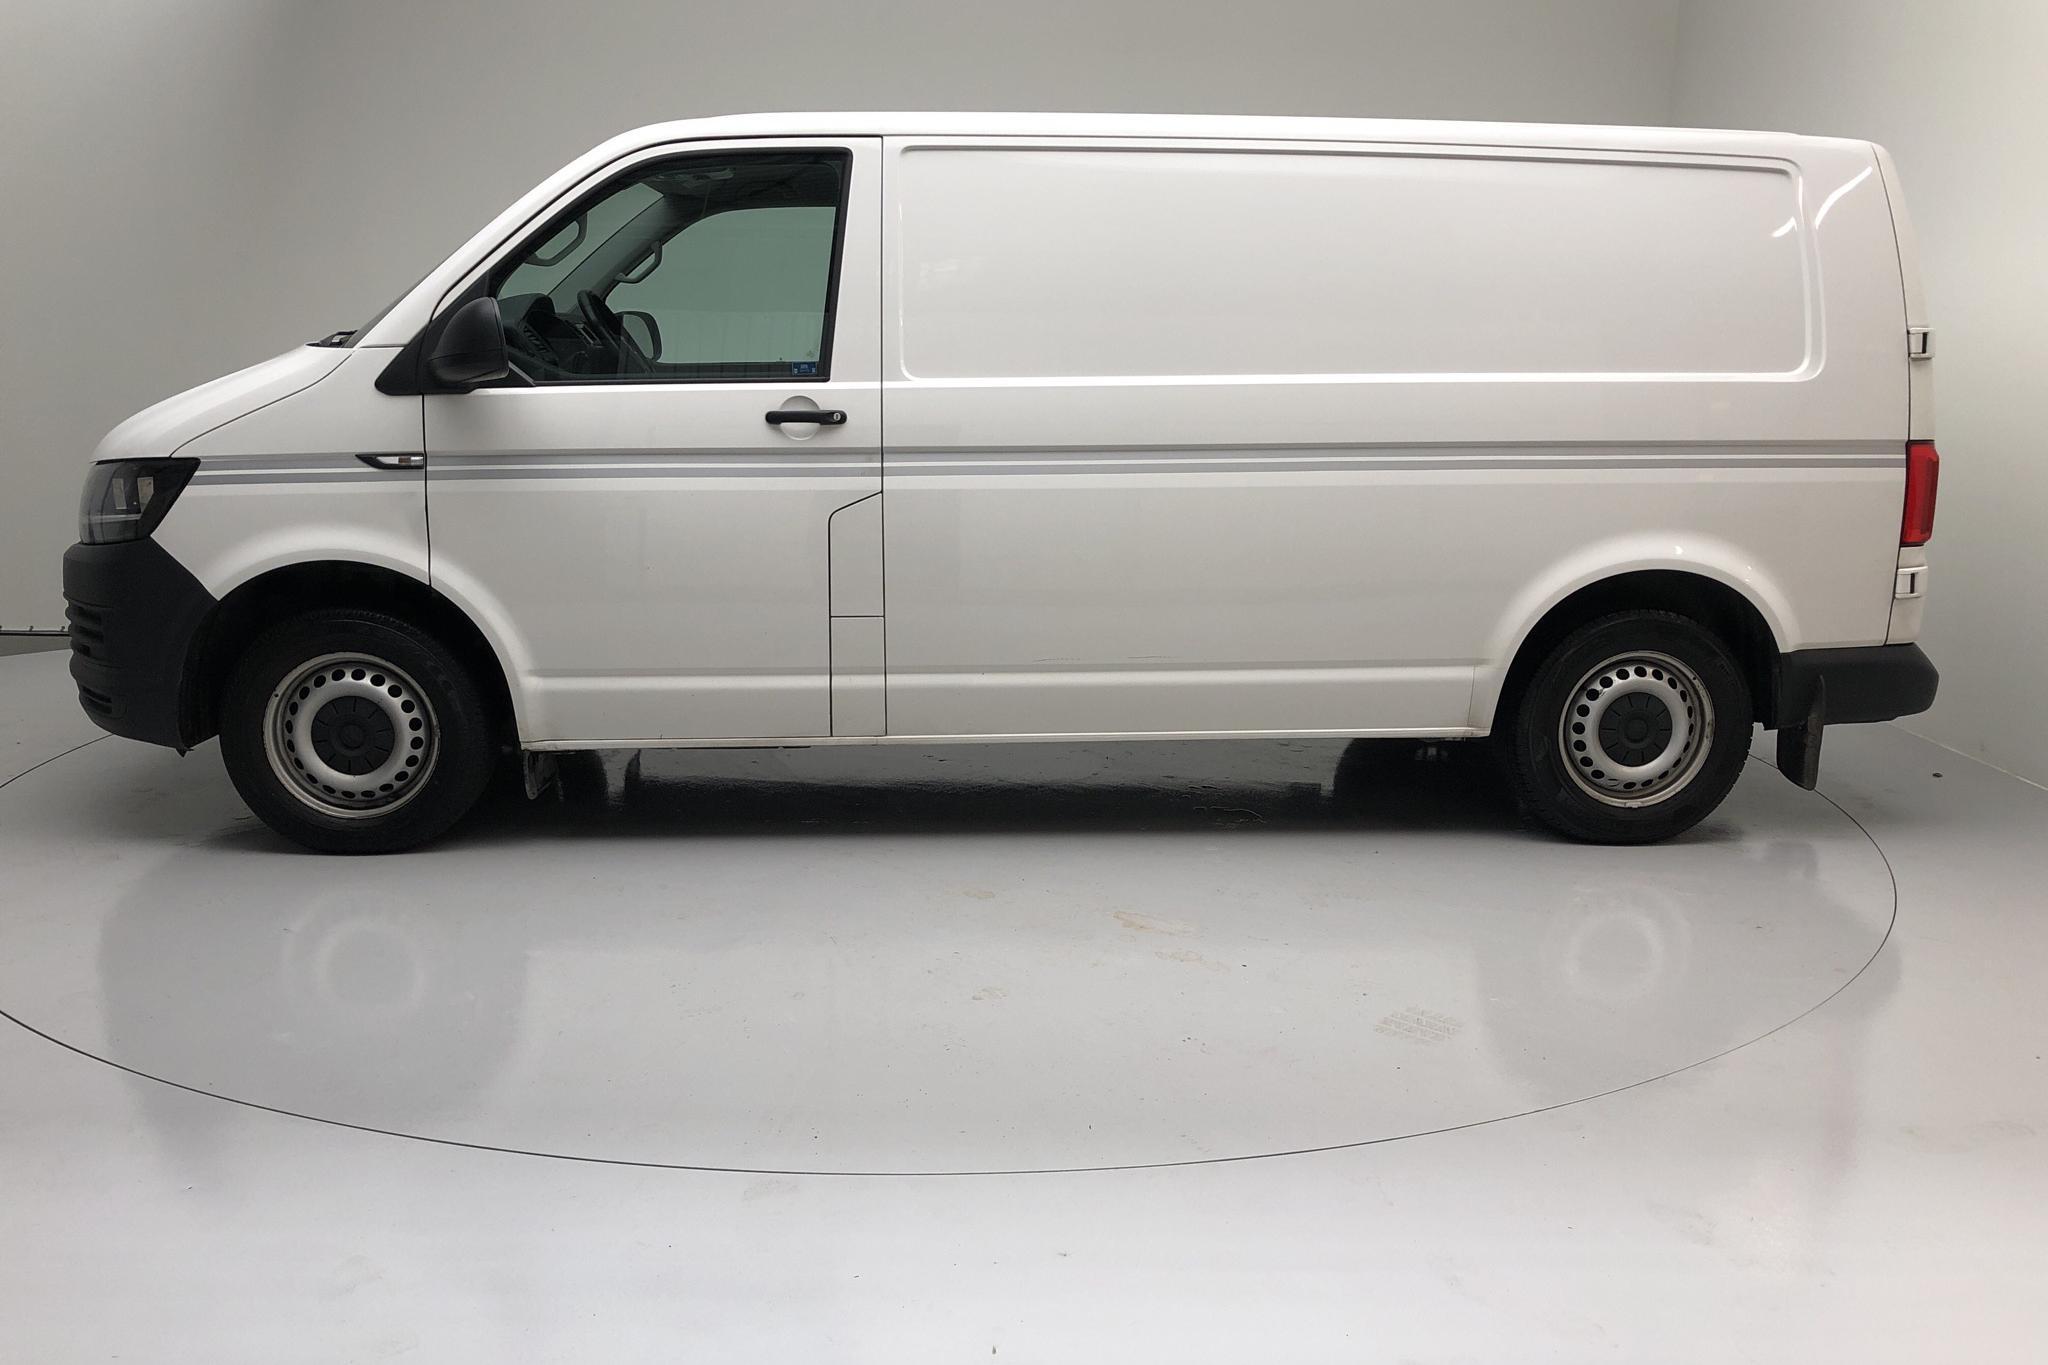 VW Transporter T6 2.0 TDI BMT Skåp (140hk) - 0 km - Automatic - white - 2016